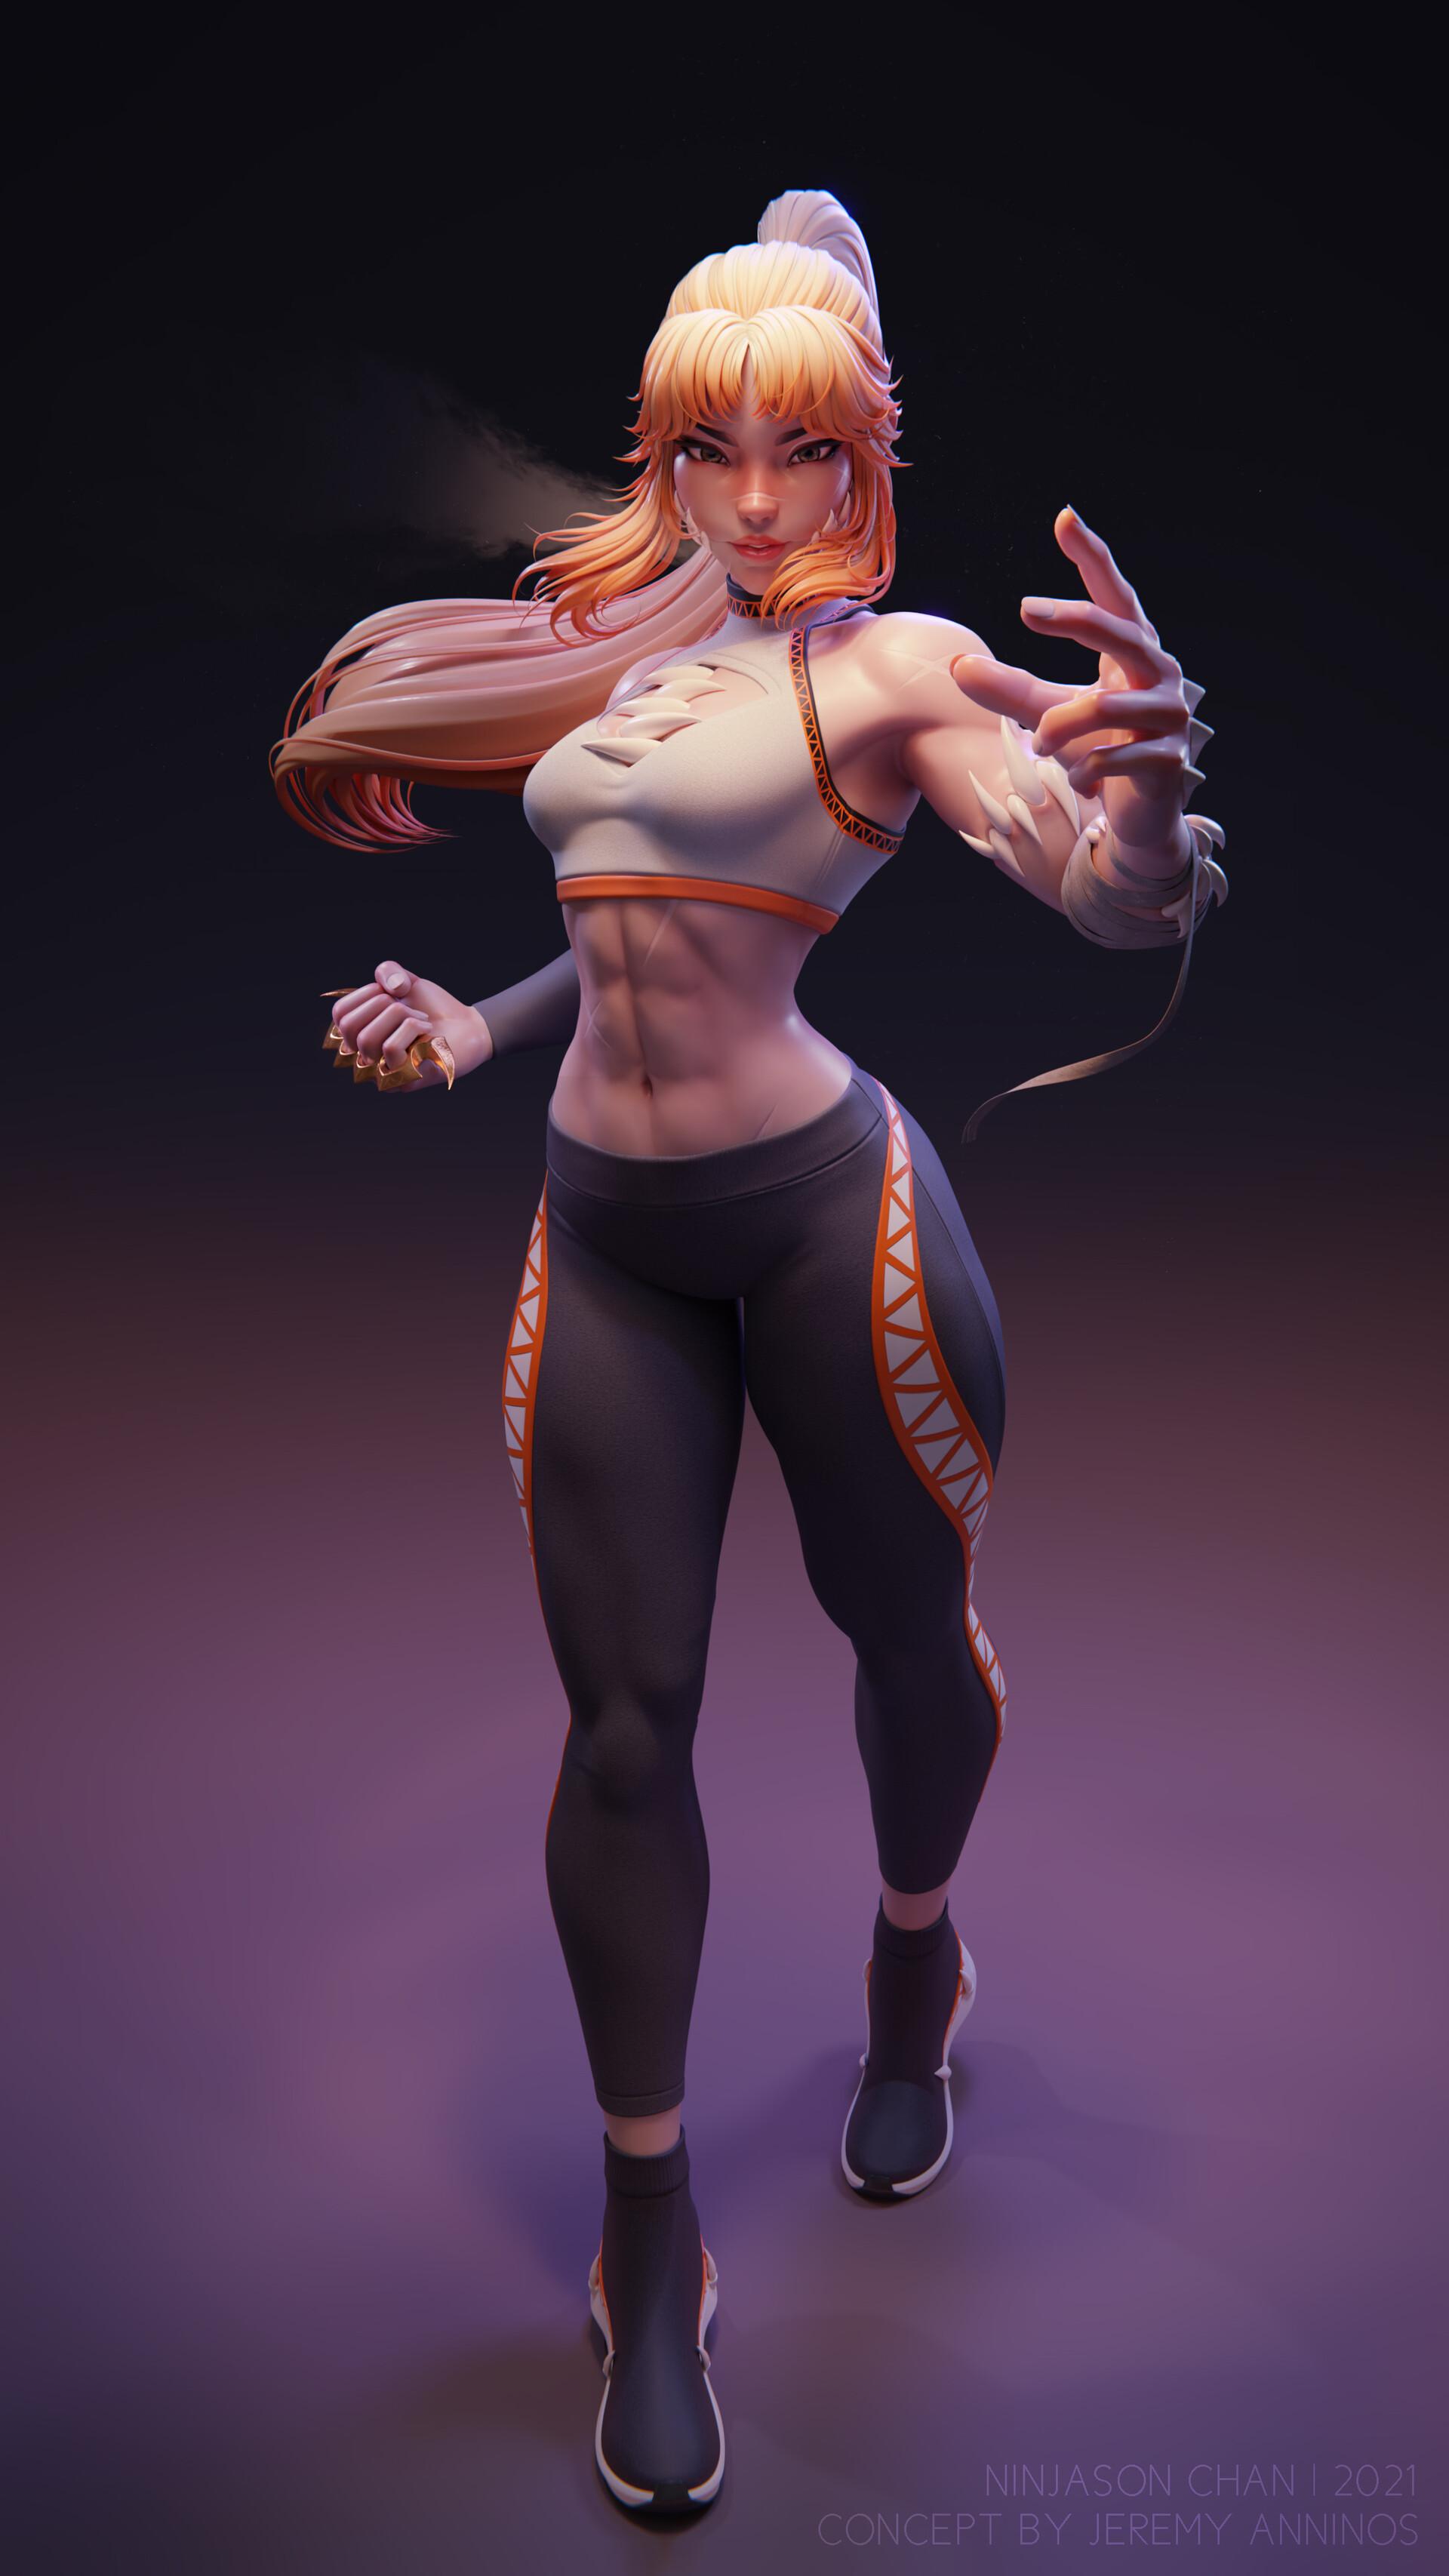 NinJason Chan ArtStation Artwork Women Gradient Digital Art Simple Background Long Hair Abs Fist Blo 1920x3413